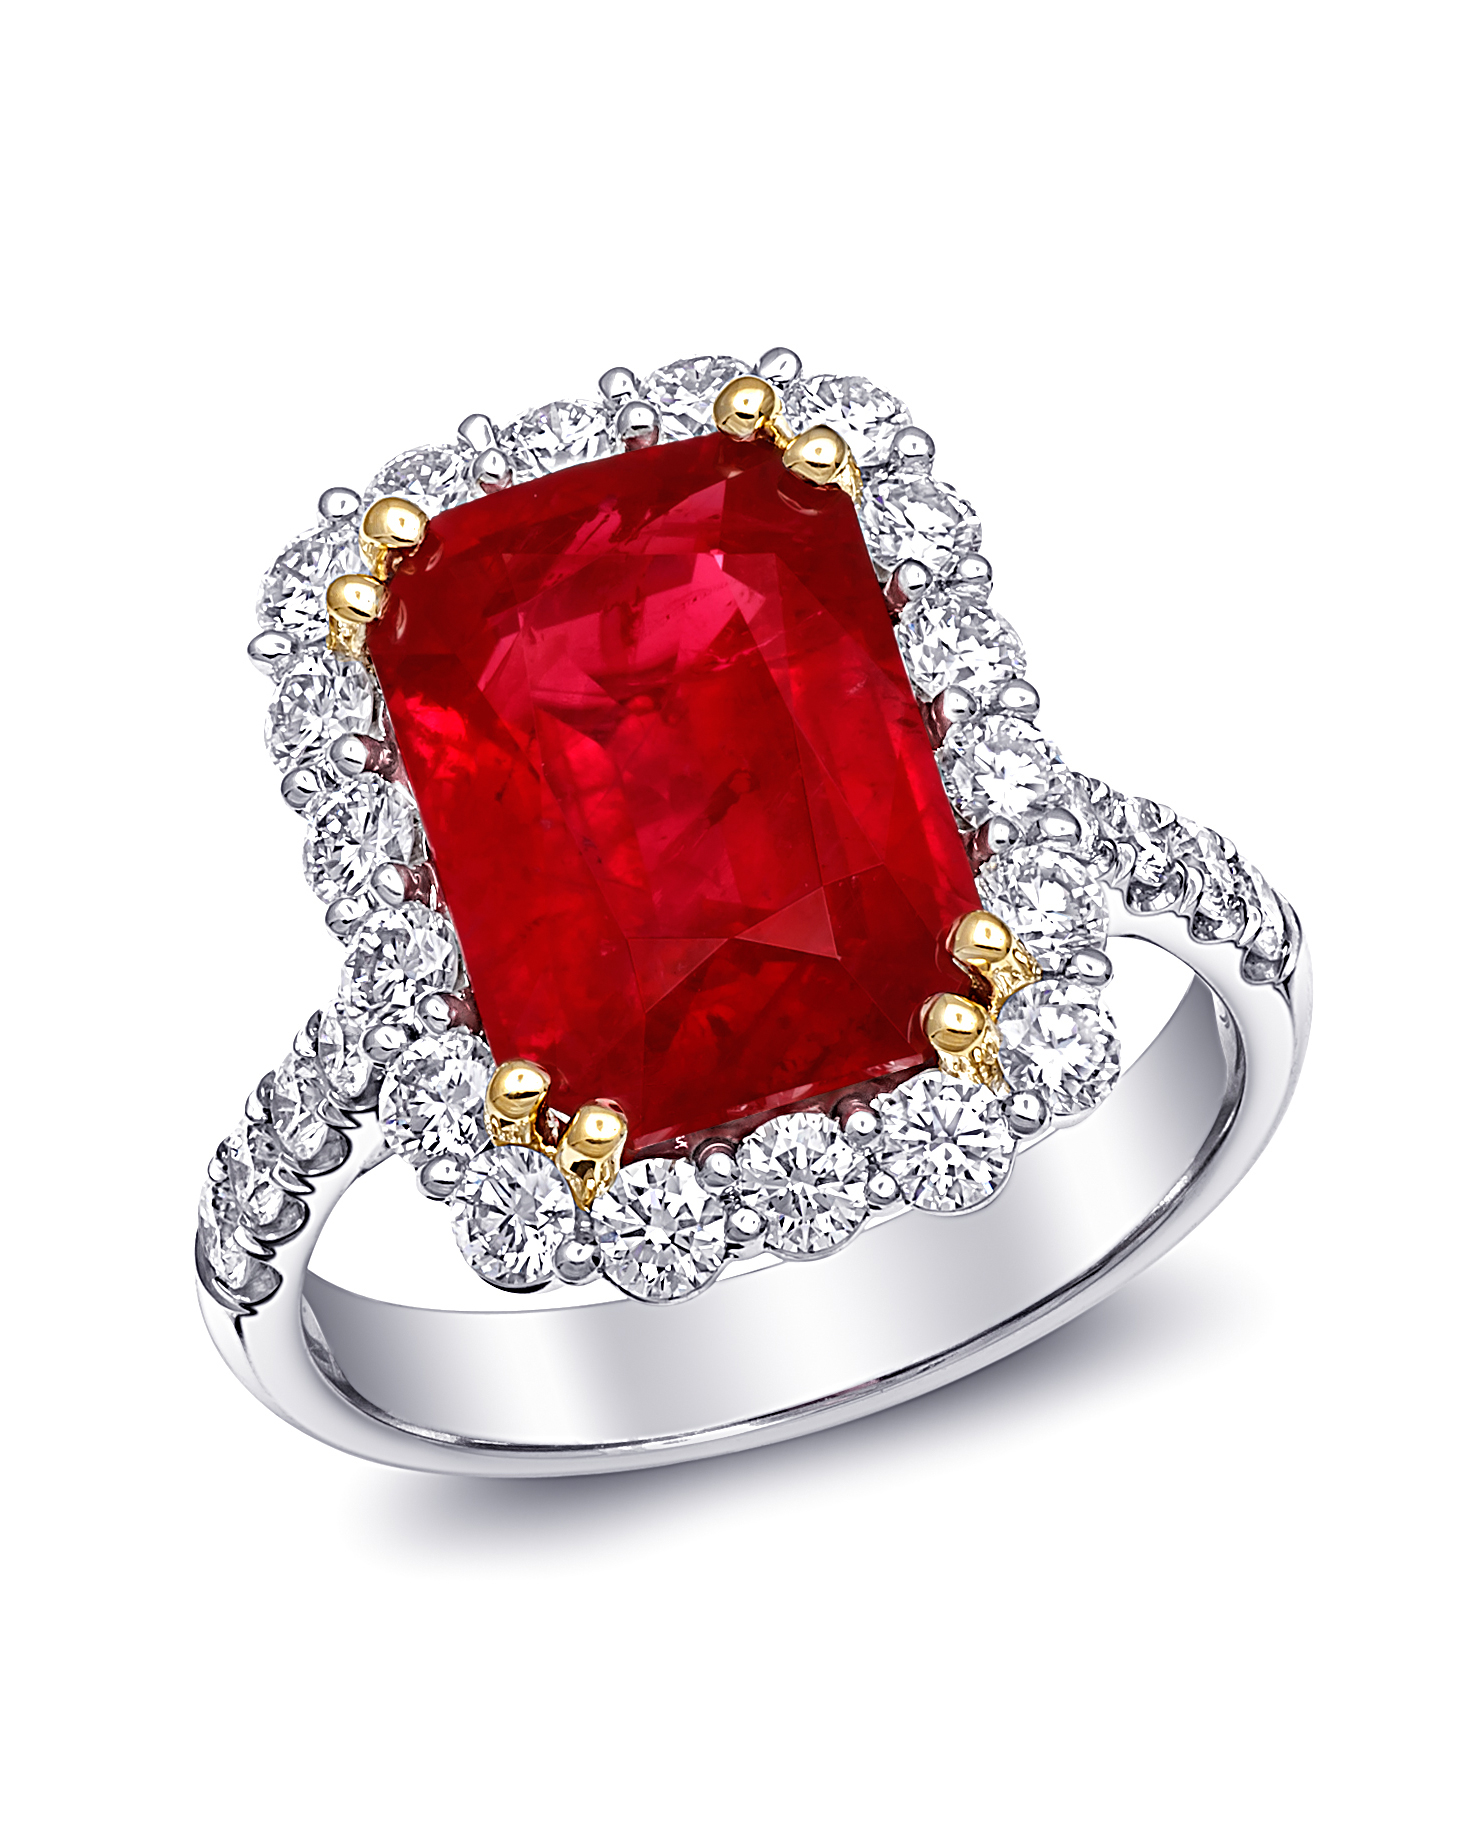 coast-diamond-ruby-engagement-ring-emerald-cut-halo-0816.jpg